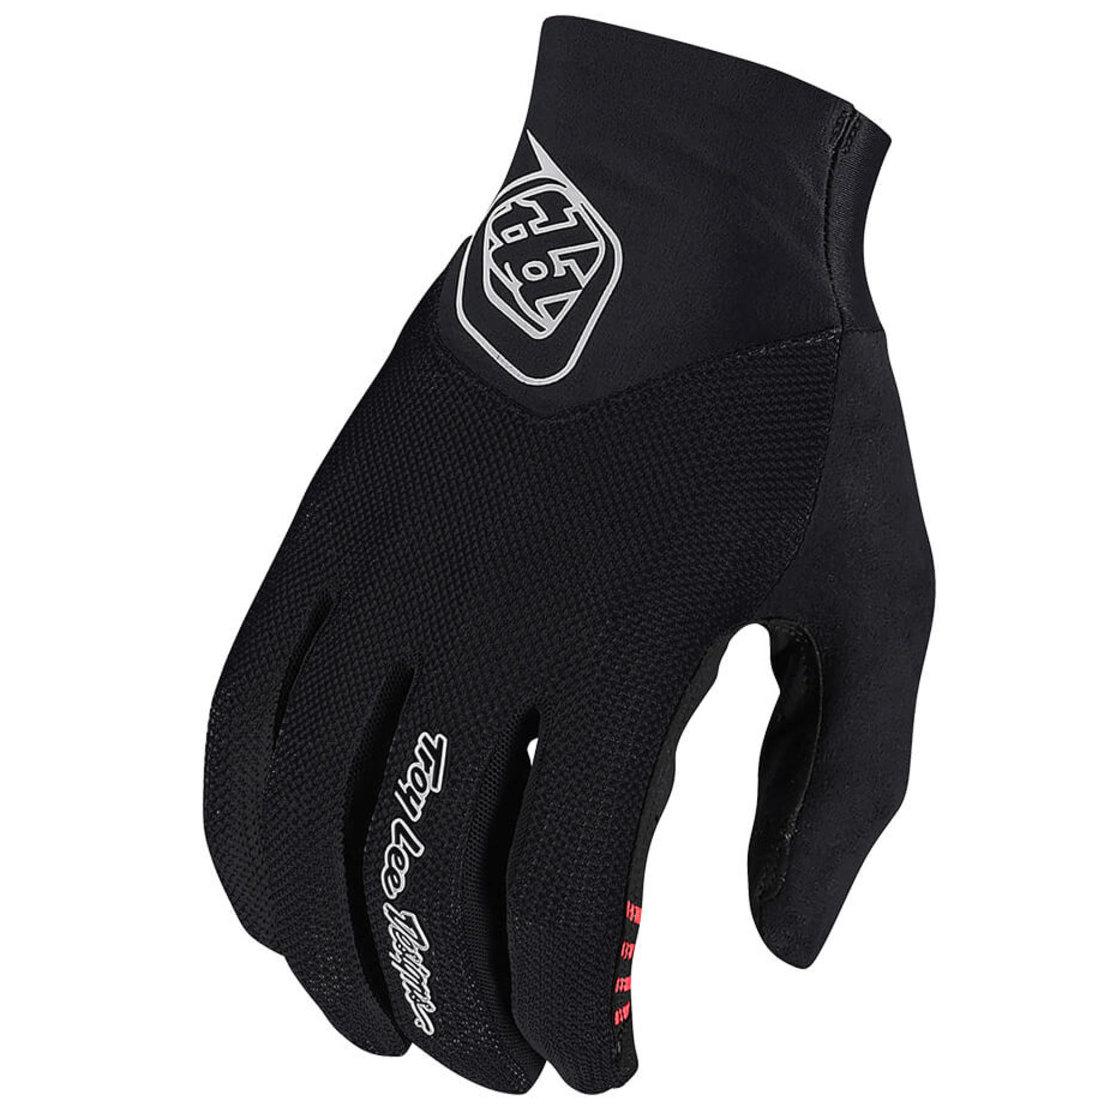 Troy Lee Designs Ace 2.0 MTB Gloves - 2019